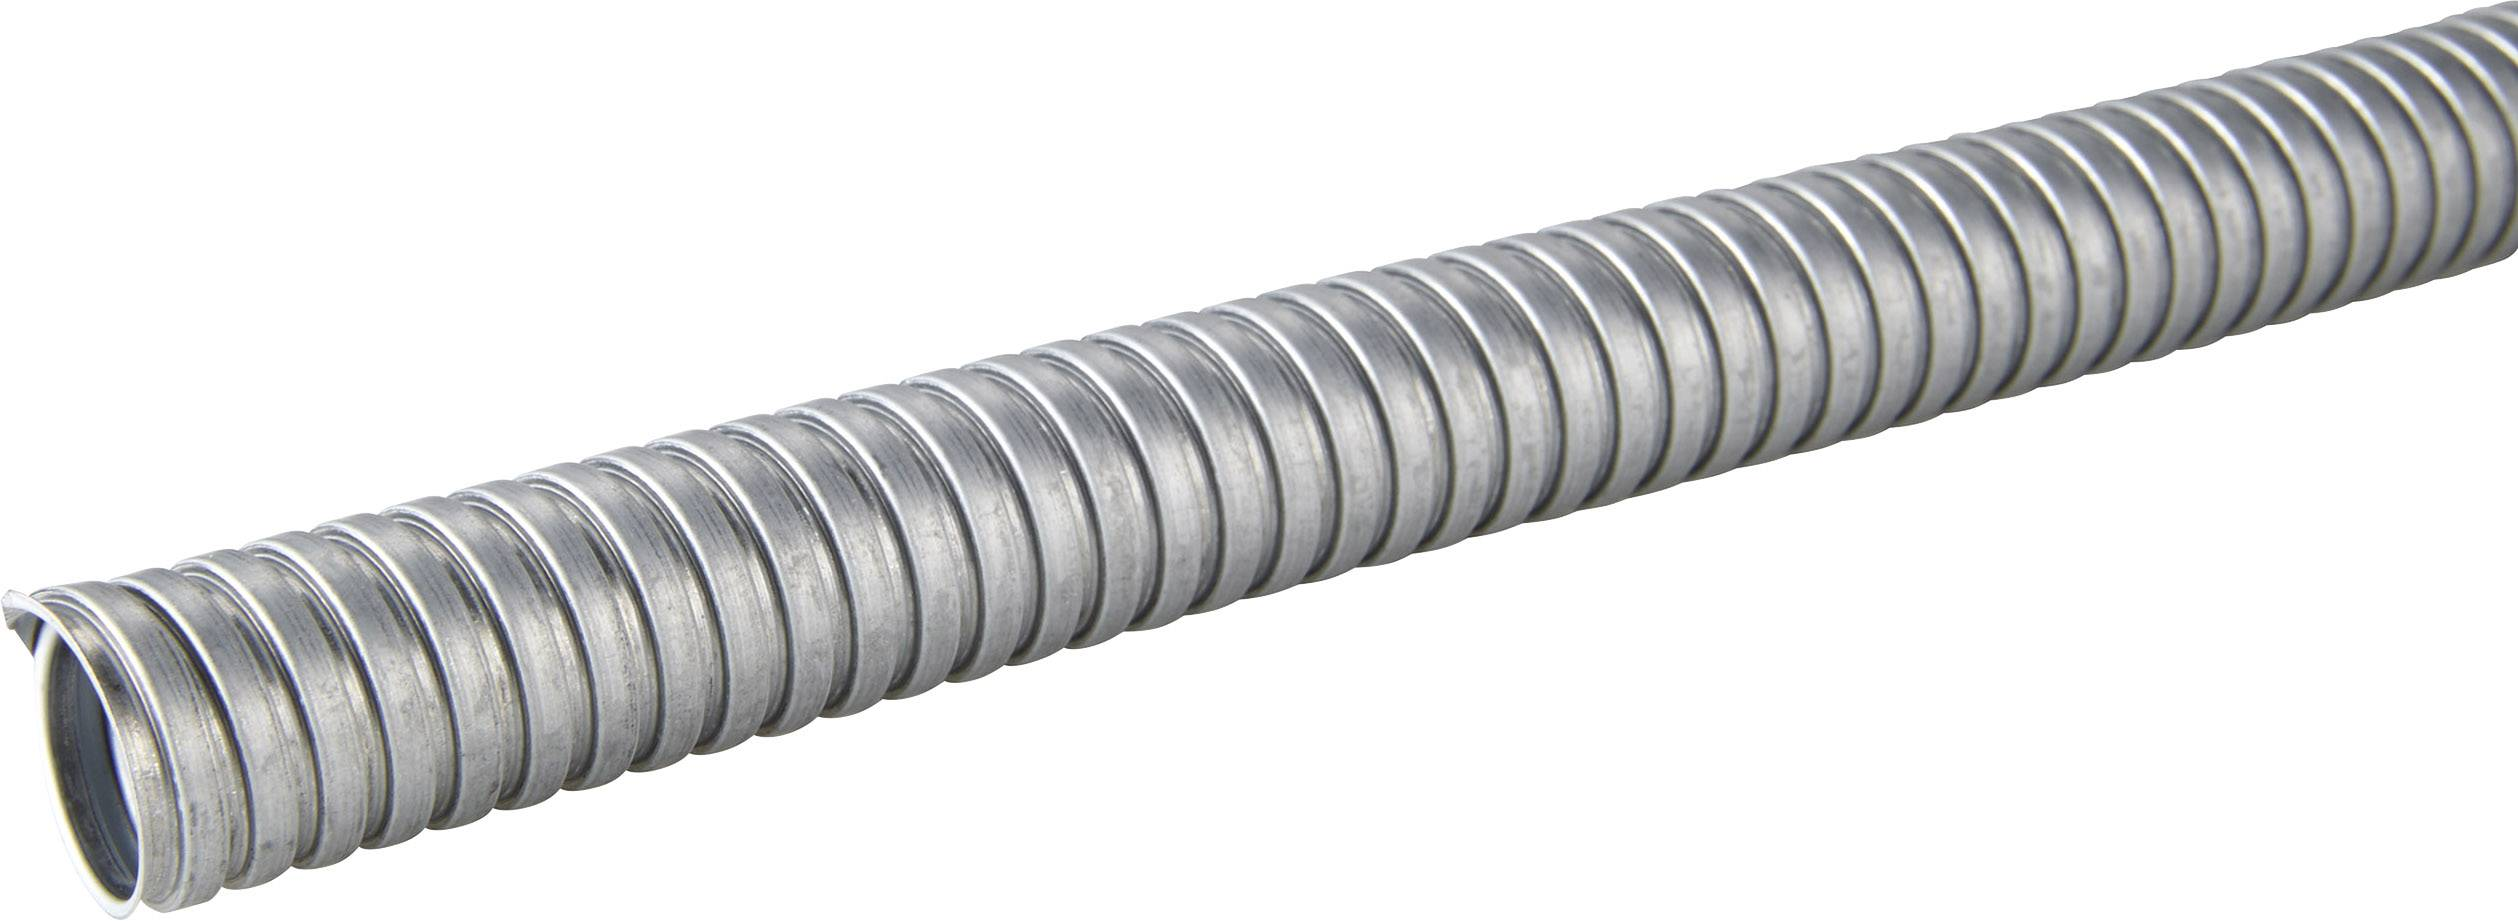 Ochranná hadice na kov LappKabel SILVYN® AS 21/23x27 61802130, stříbrná, 50 m